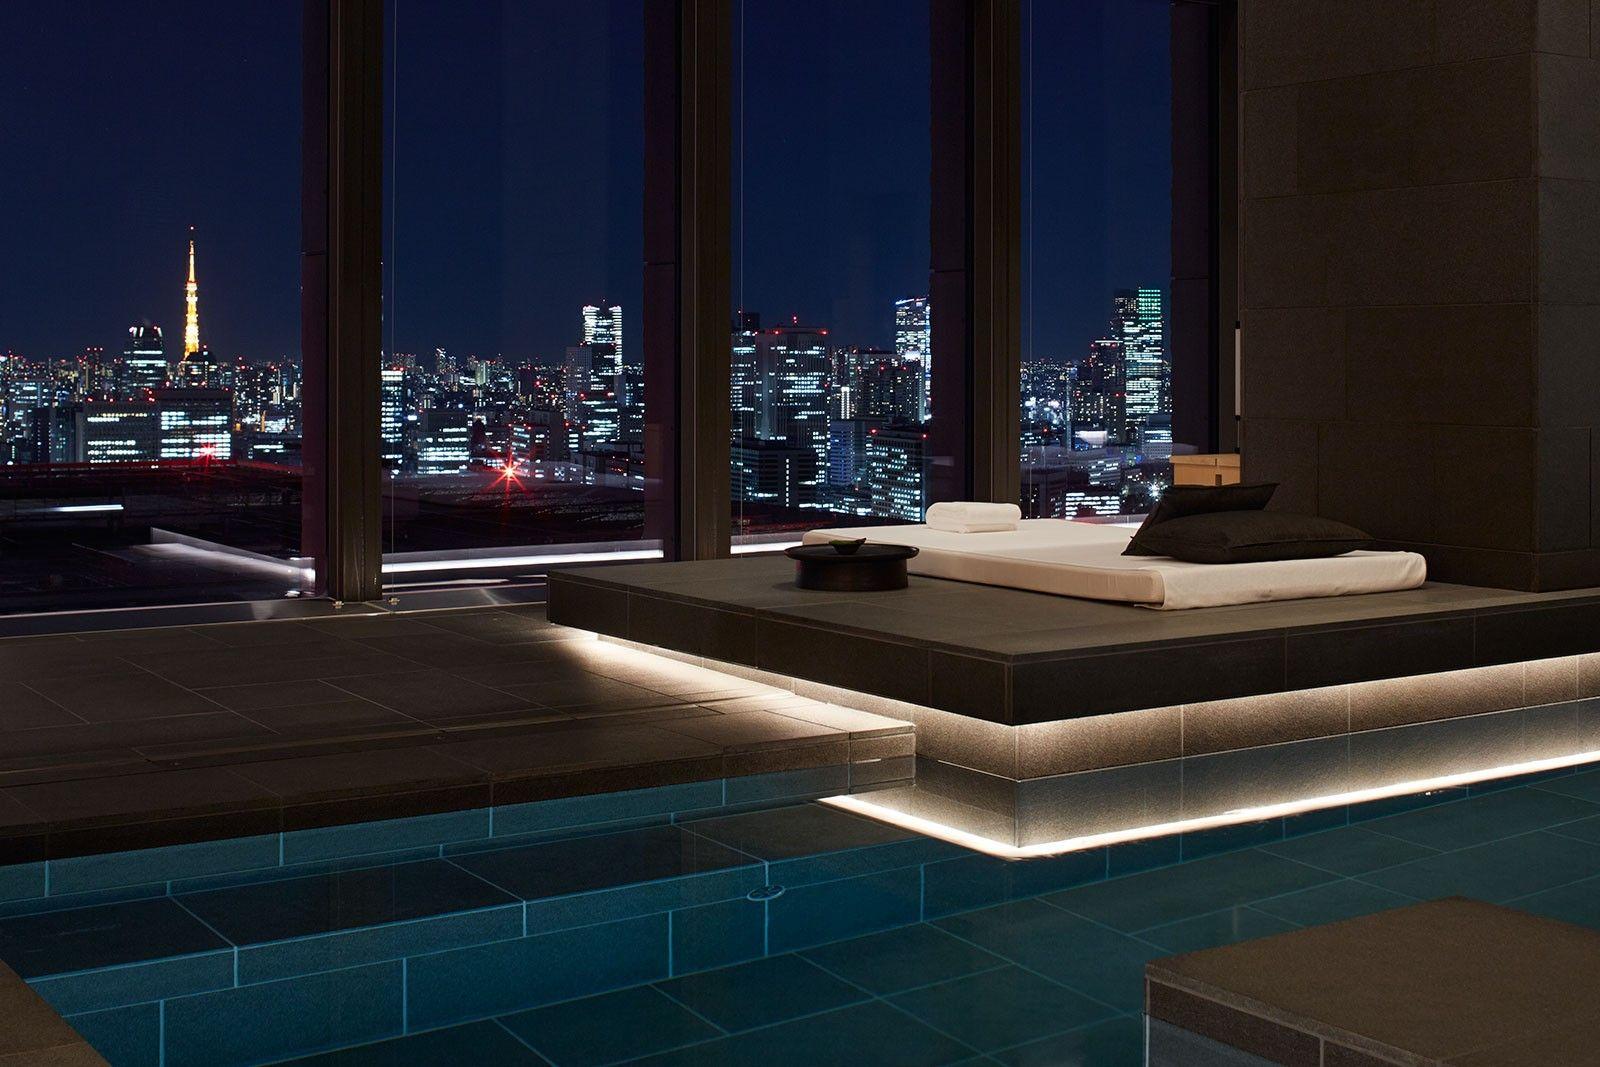 Aman Tokyo Explore Aman Tokyo Explore Our Luxury Hotels Aman ラグジュアリープール スイミングプール 屋内プール